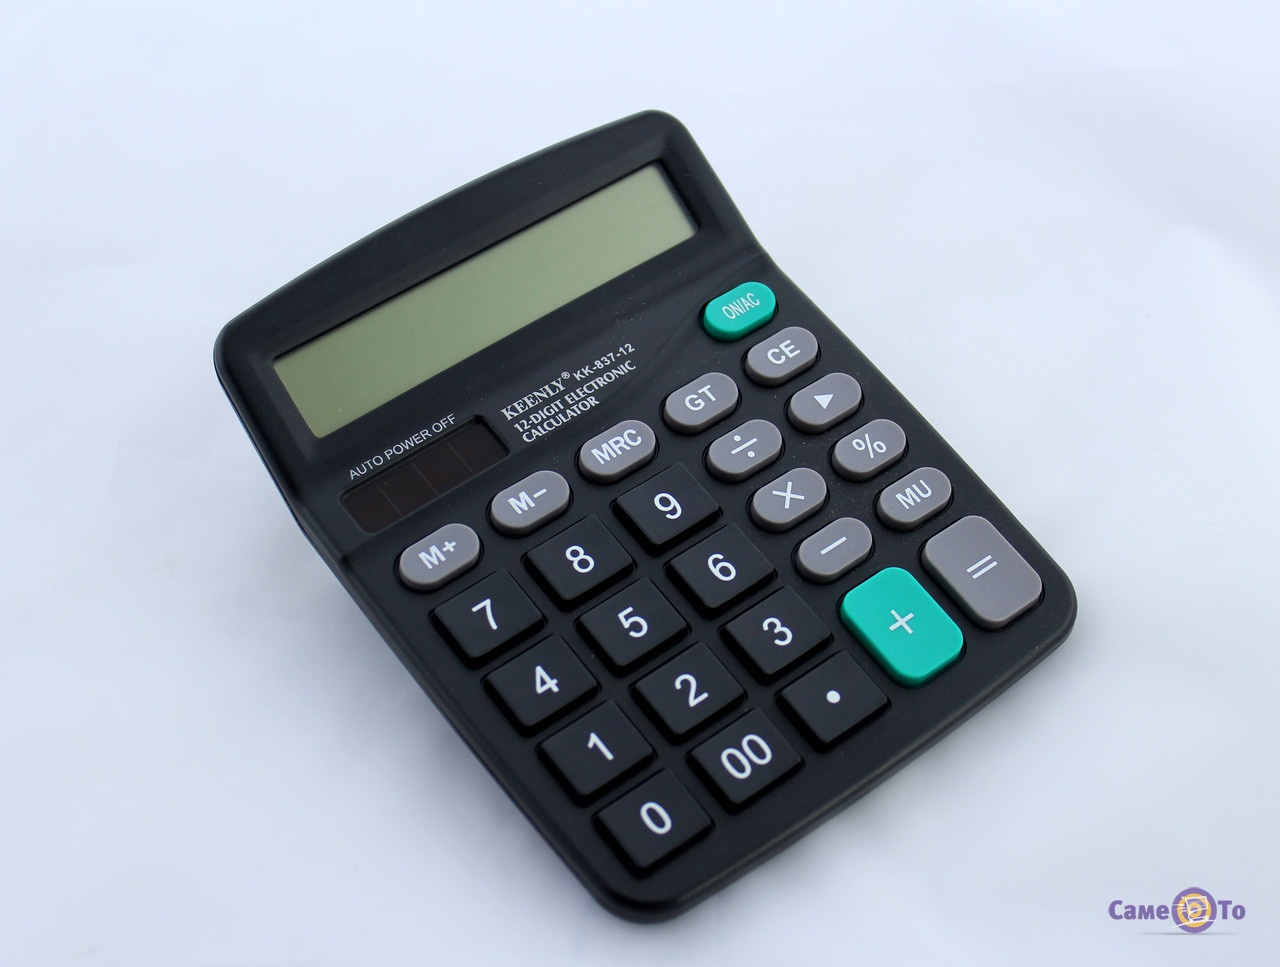 Калькулятор для алгебры - супер калькулятор Keenly KK-837-12